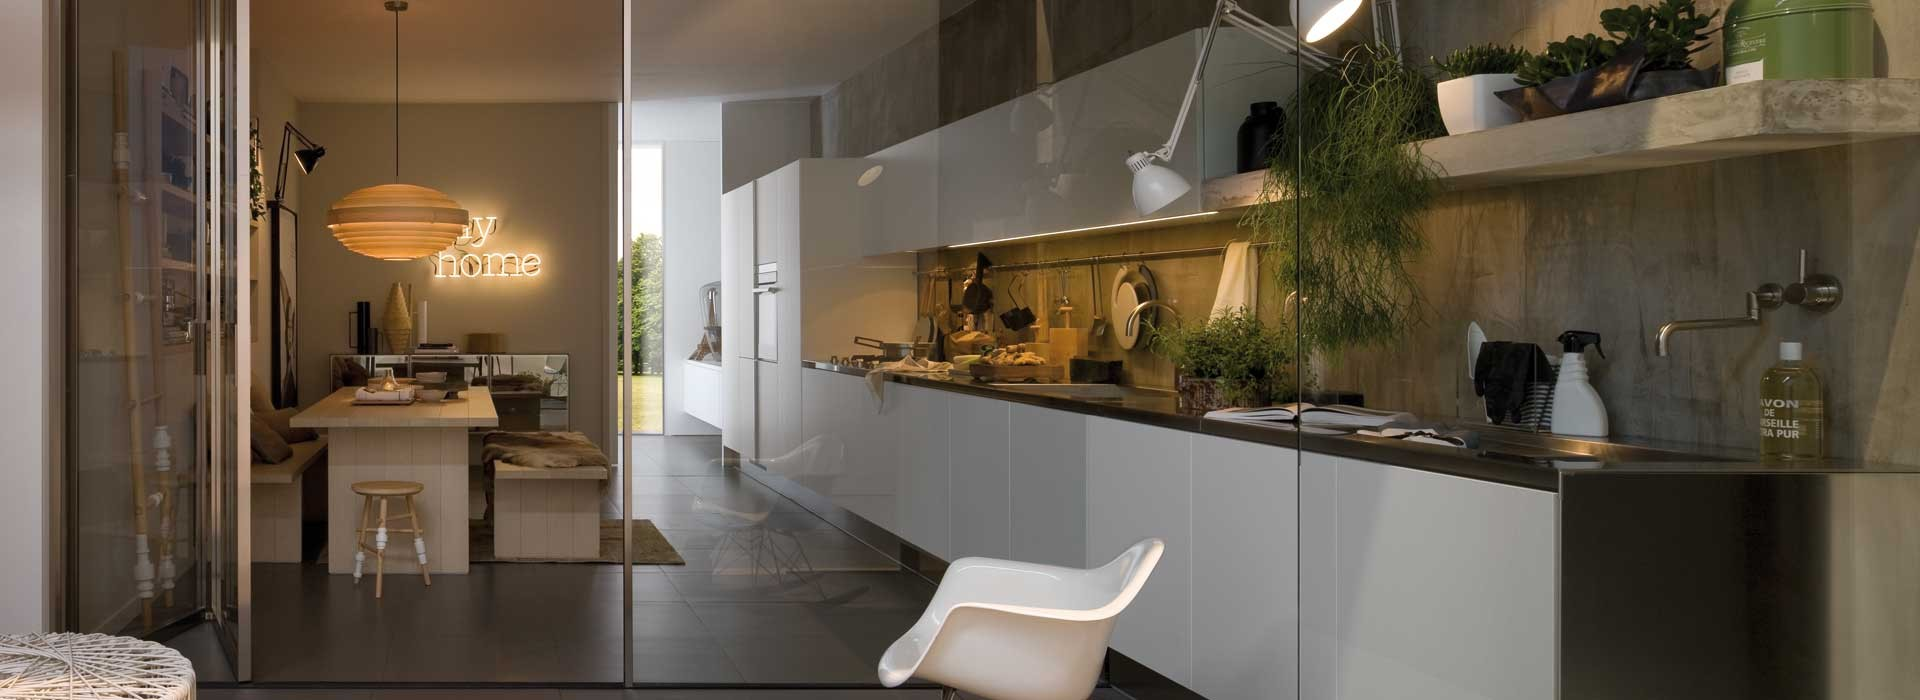 Arclinea Gamma design keuken afwerking hoogglans wit